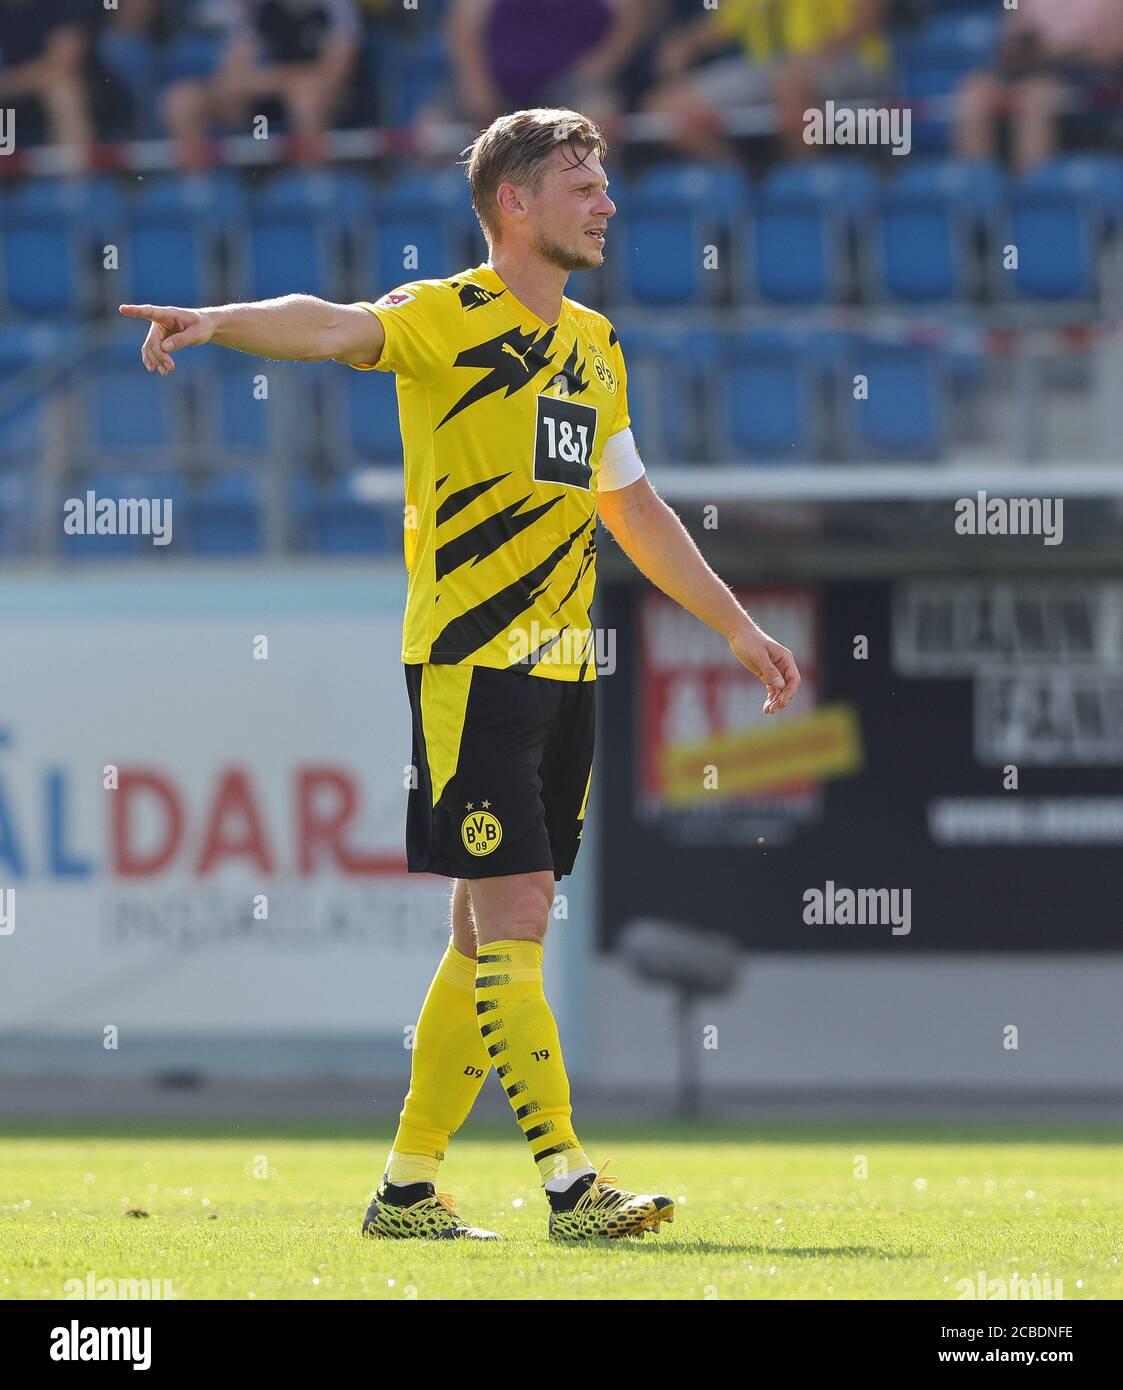 firo: 12.08.2020, football, 1st Bundesliga, season 2020/2021, BVB ...